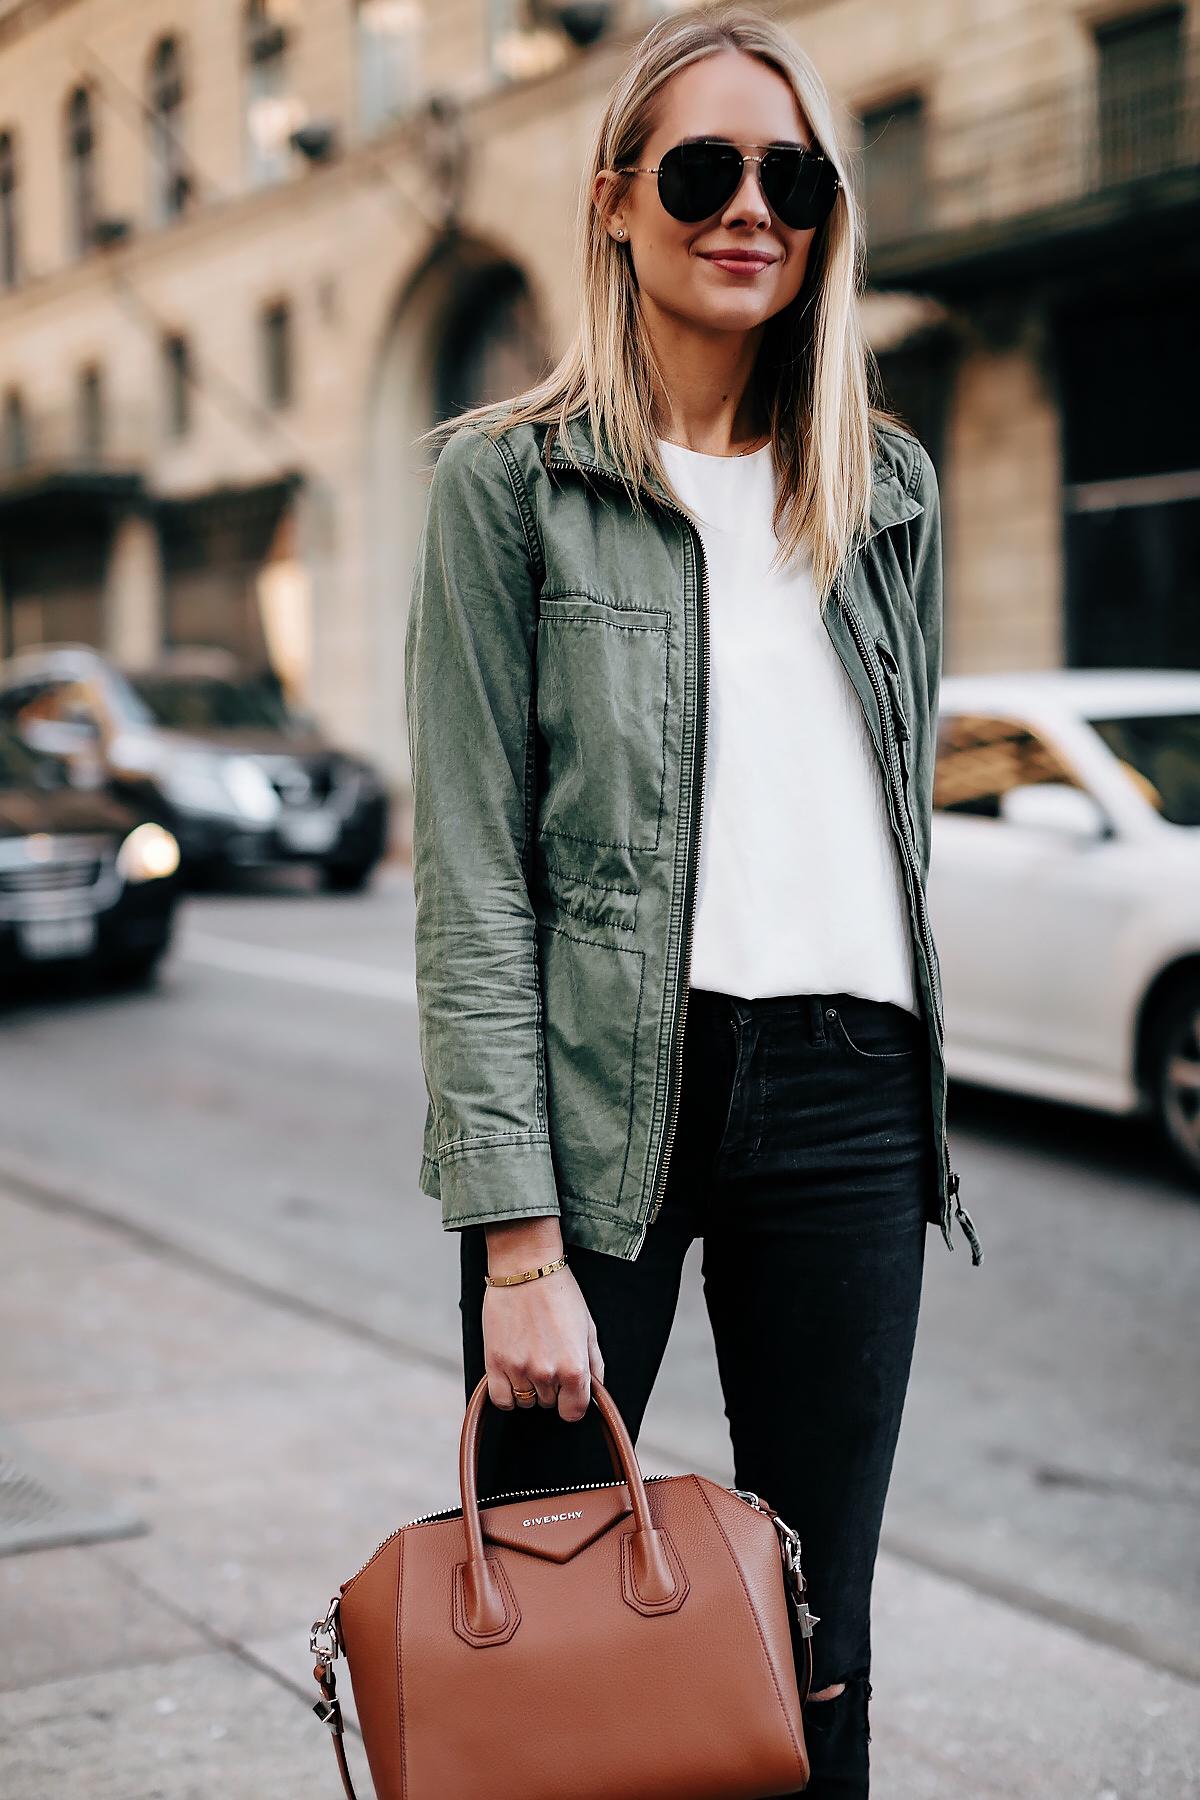 Blonde Woman Wearing Madewell Utility Green Jacket White Top Black Jeans Givenchy Antigona Cognac Handbag Fashion Jackson San Diego Fashion Blogger Street Style